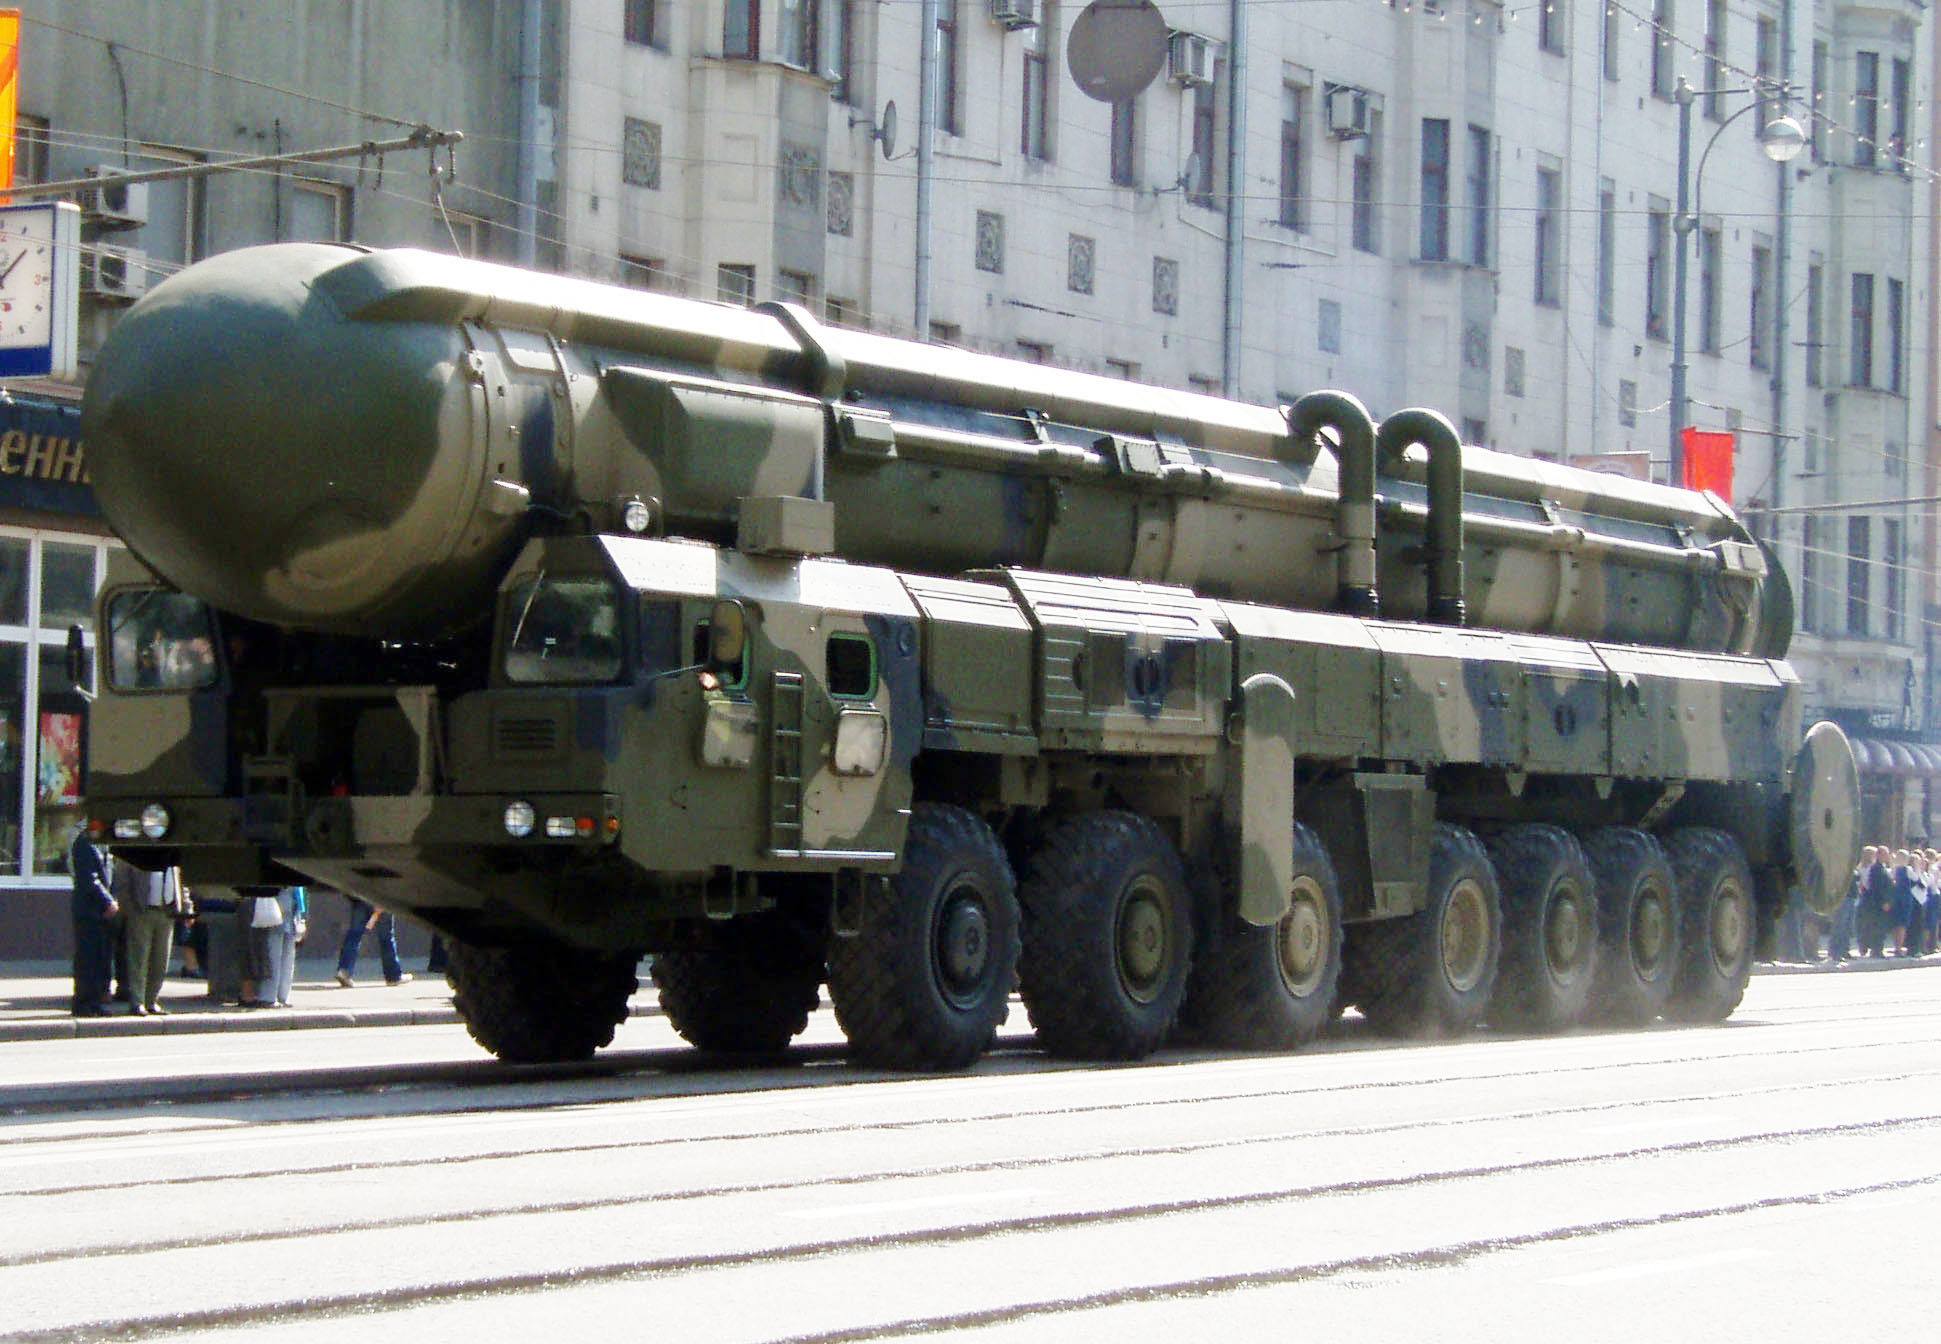 http://upload.wikimedia.org/wikipedia/commons/0/00/Moscow_Parad_2008_Ballist.jpg